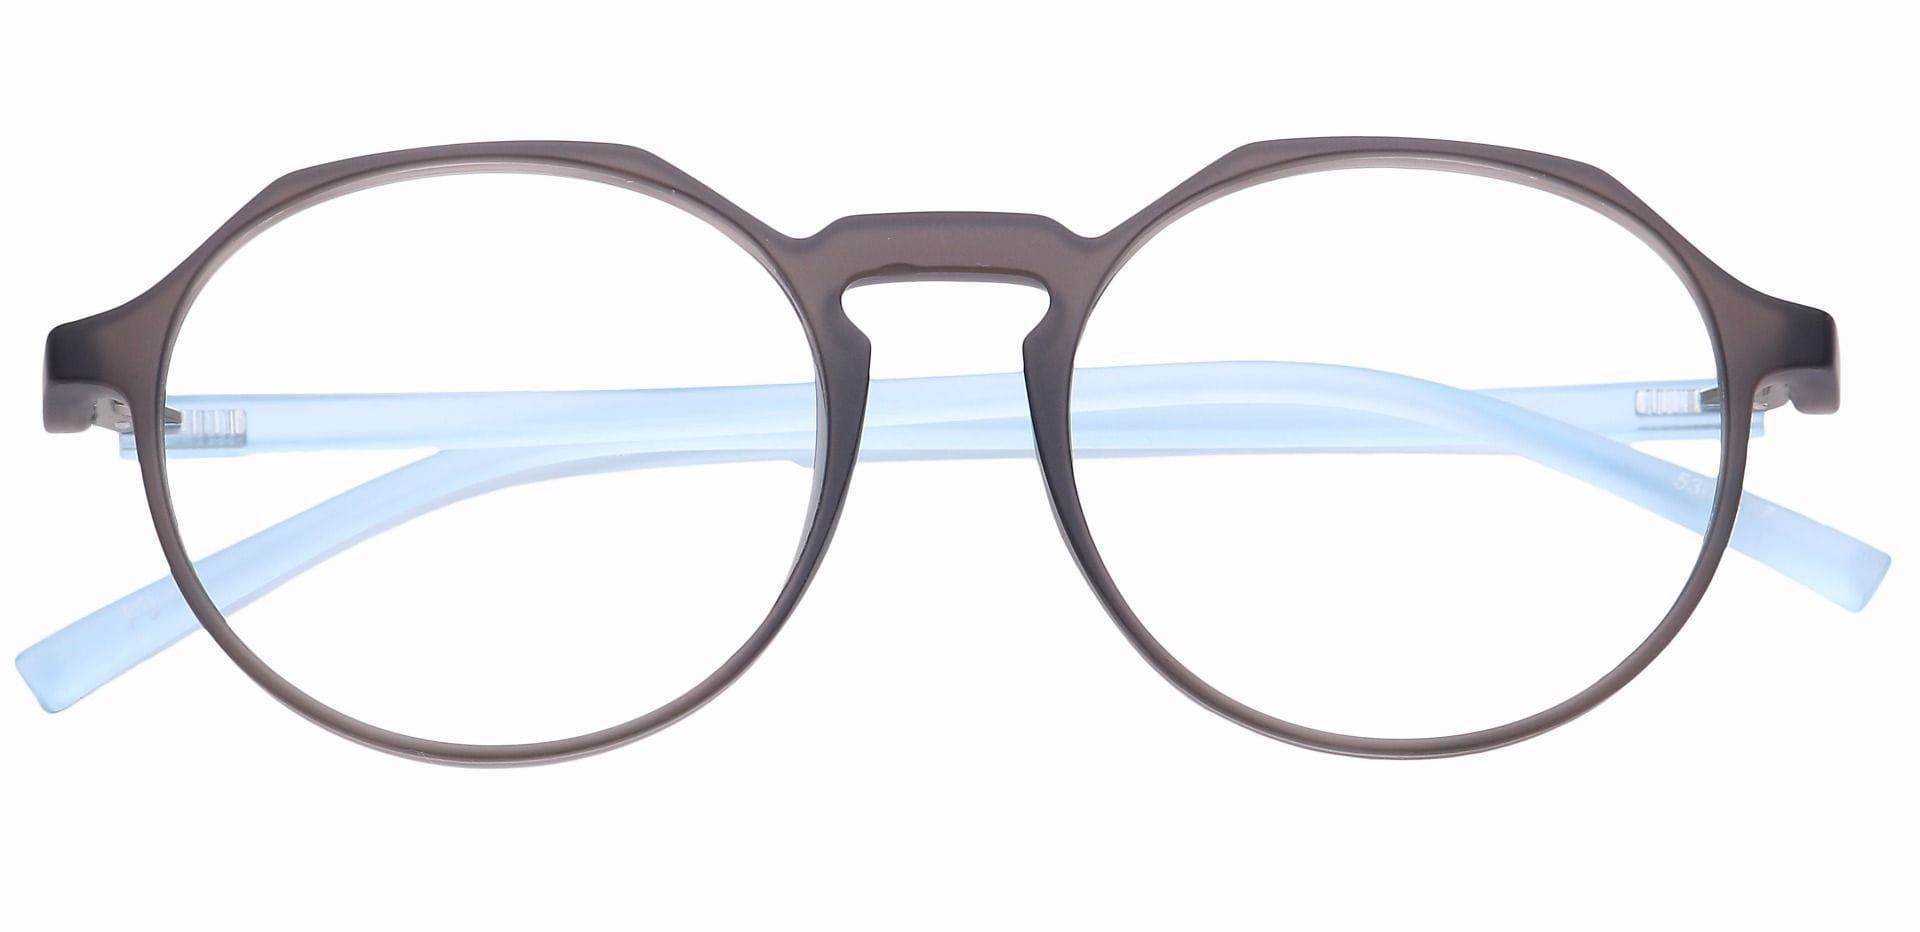 Dash Oval Eyeglasses Frame - Gray